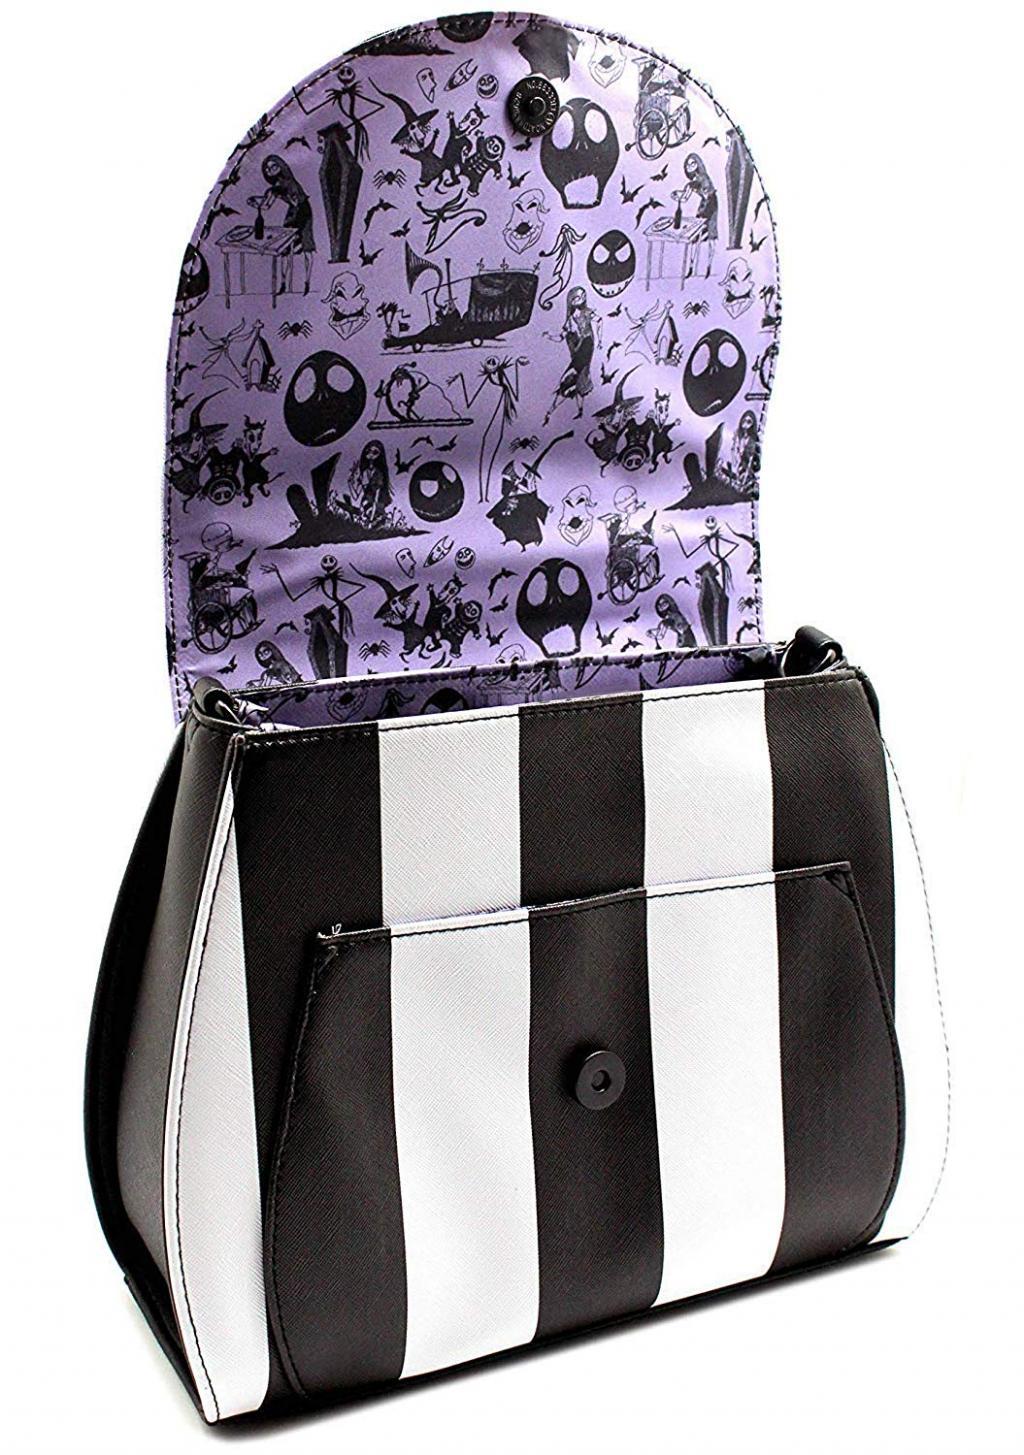 DISNEY - NBC Striped Saddle Xbody Bag 'LoungeFly'_4